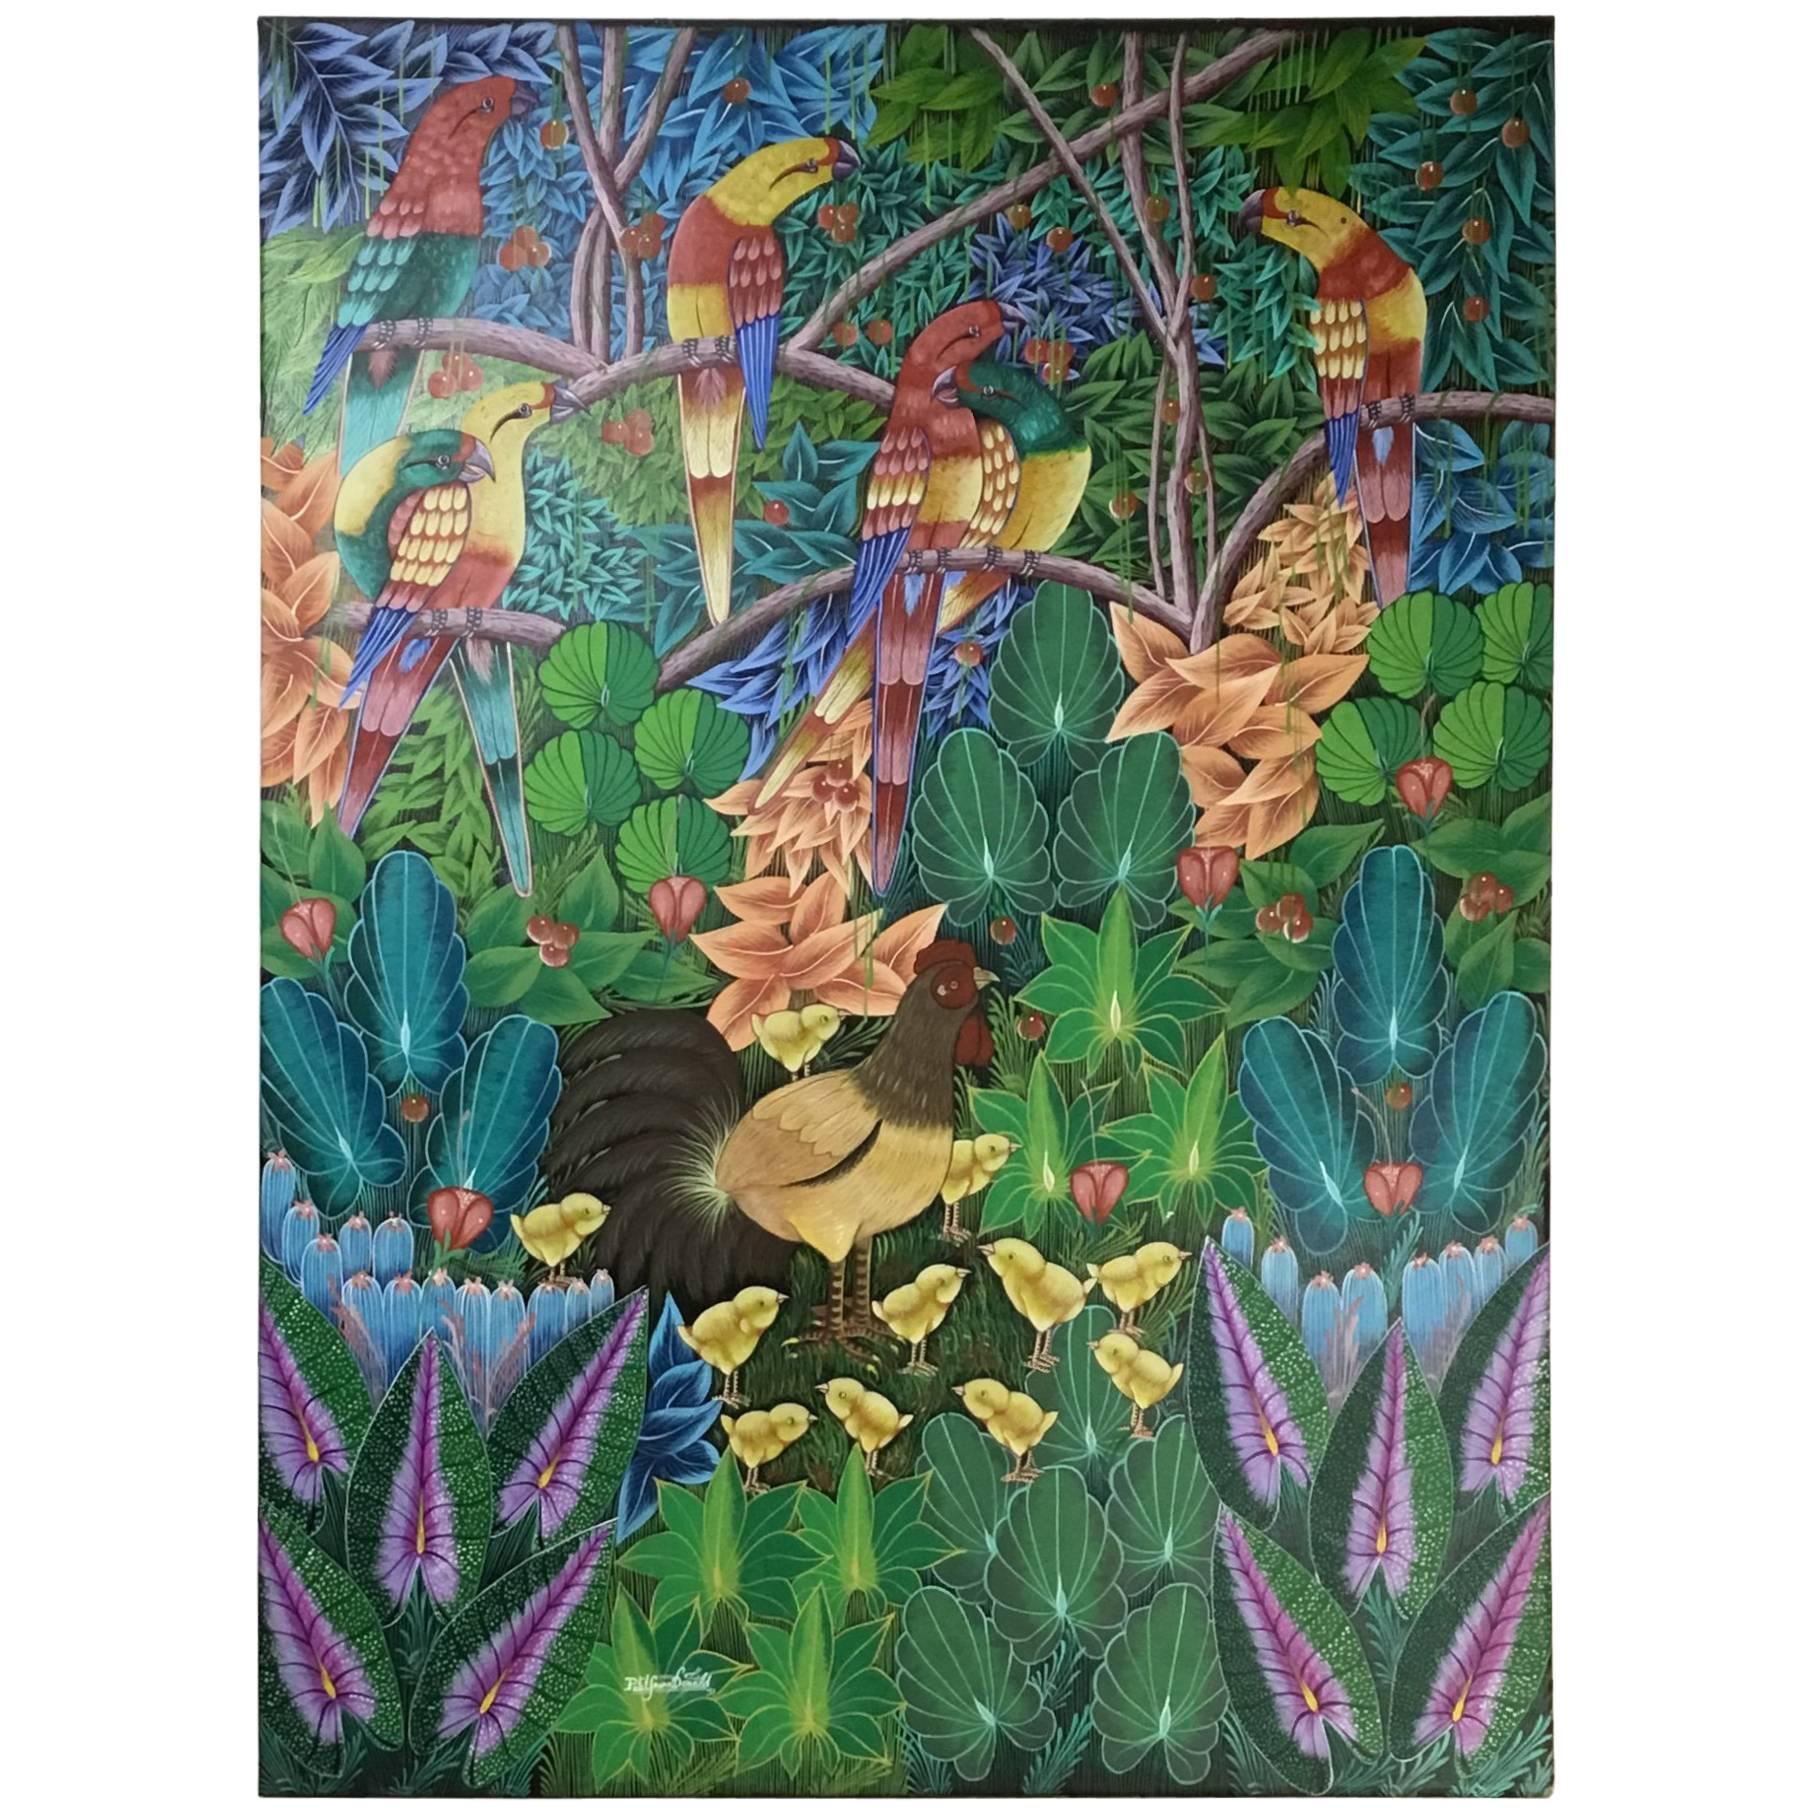 Haitian Oil Painting on Canvas